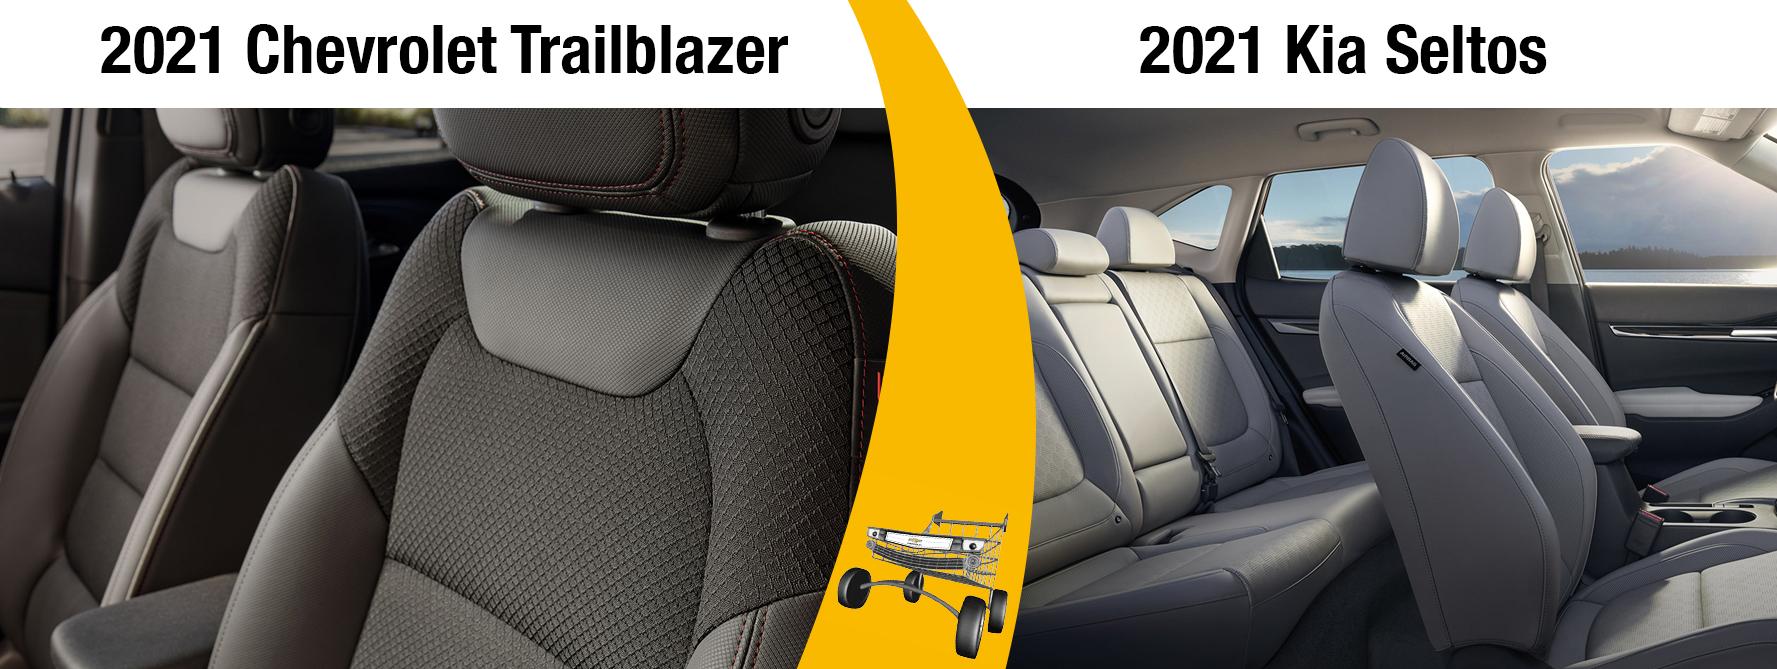 2021 Chevrolet Trailblazer vs 2021 Kia Seltos Features